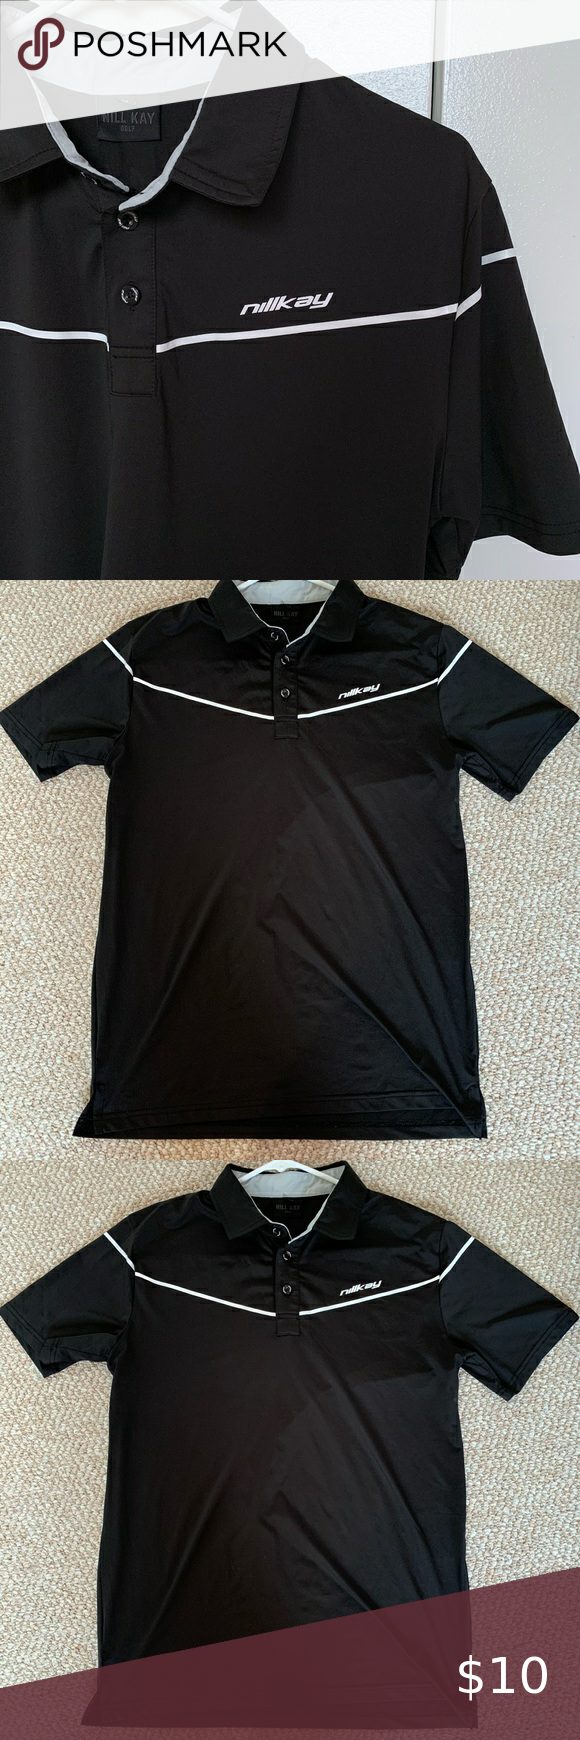 Nillkay Men S Golf Shirt Black Polo Shirt Golf Shirts Ralph Lauren Polo Shirts